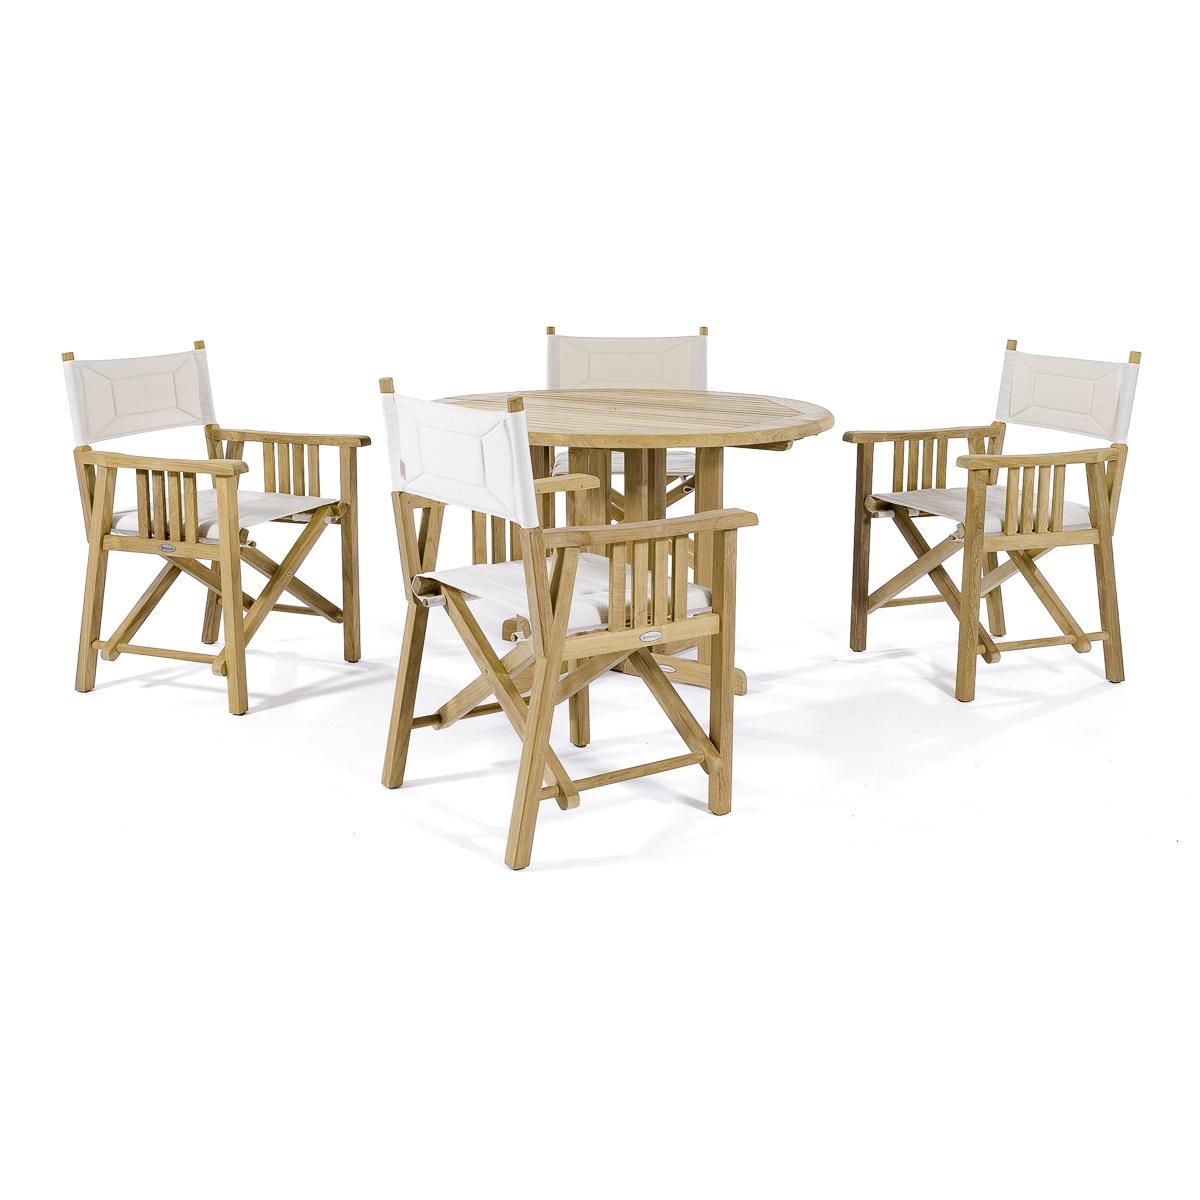 Barbuda Teak Folding Dining Set Westminster Teak Outdoor  : folding teak patio tables from westminsterteak.com size 1200 x 1200 jpeg 177kB